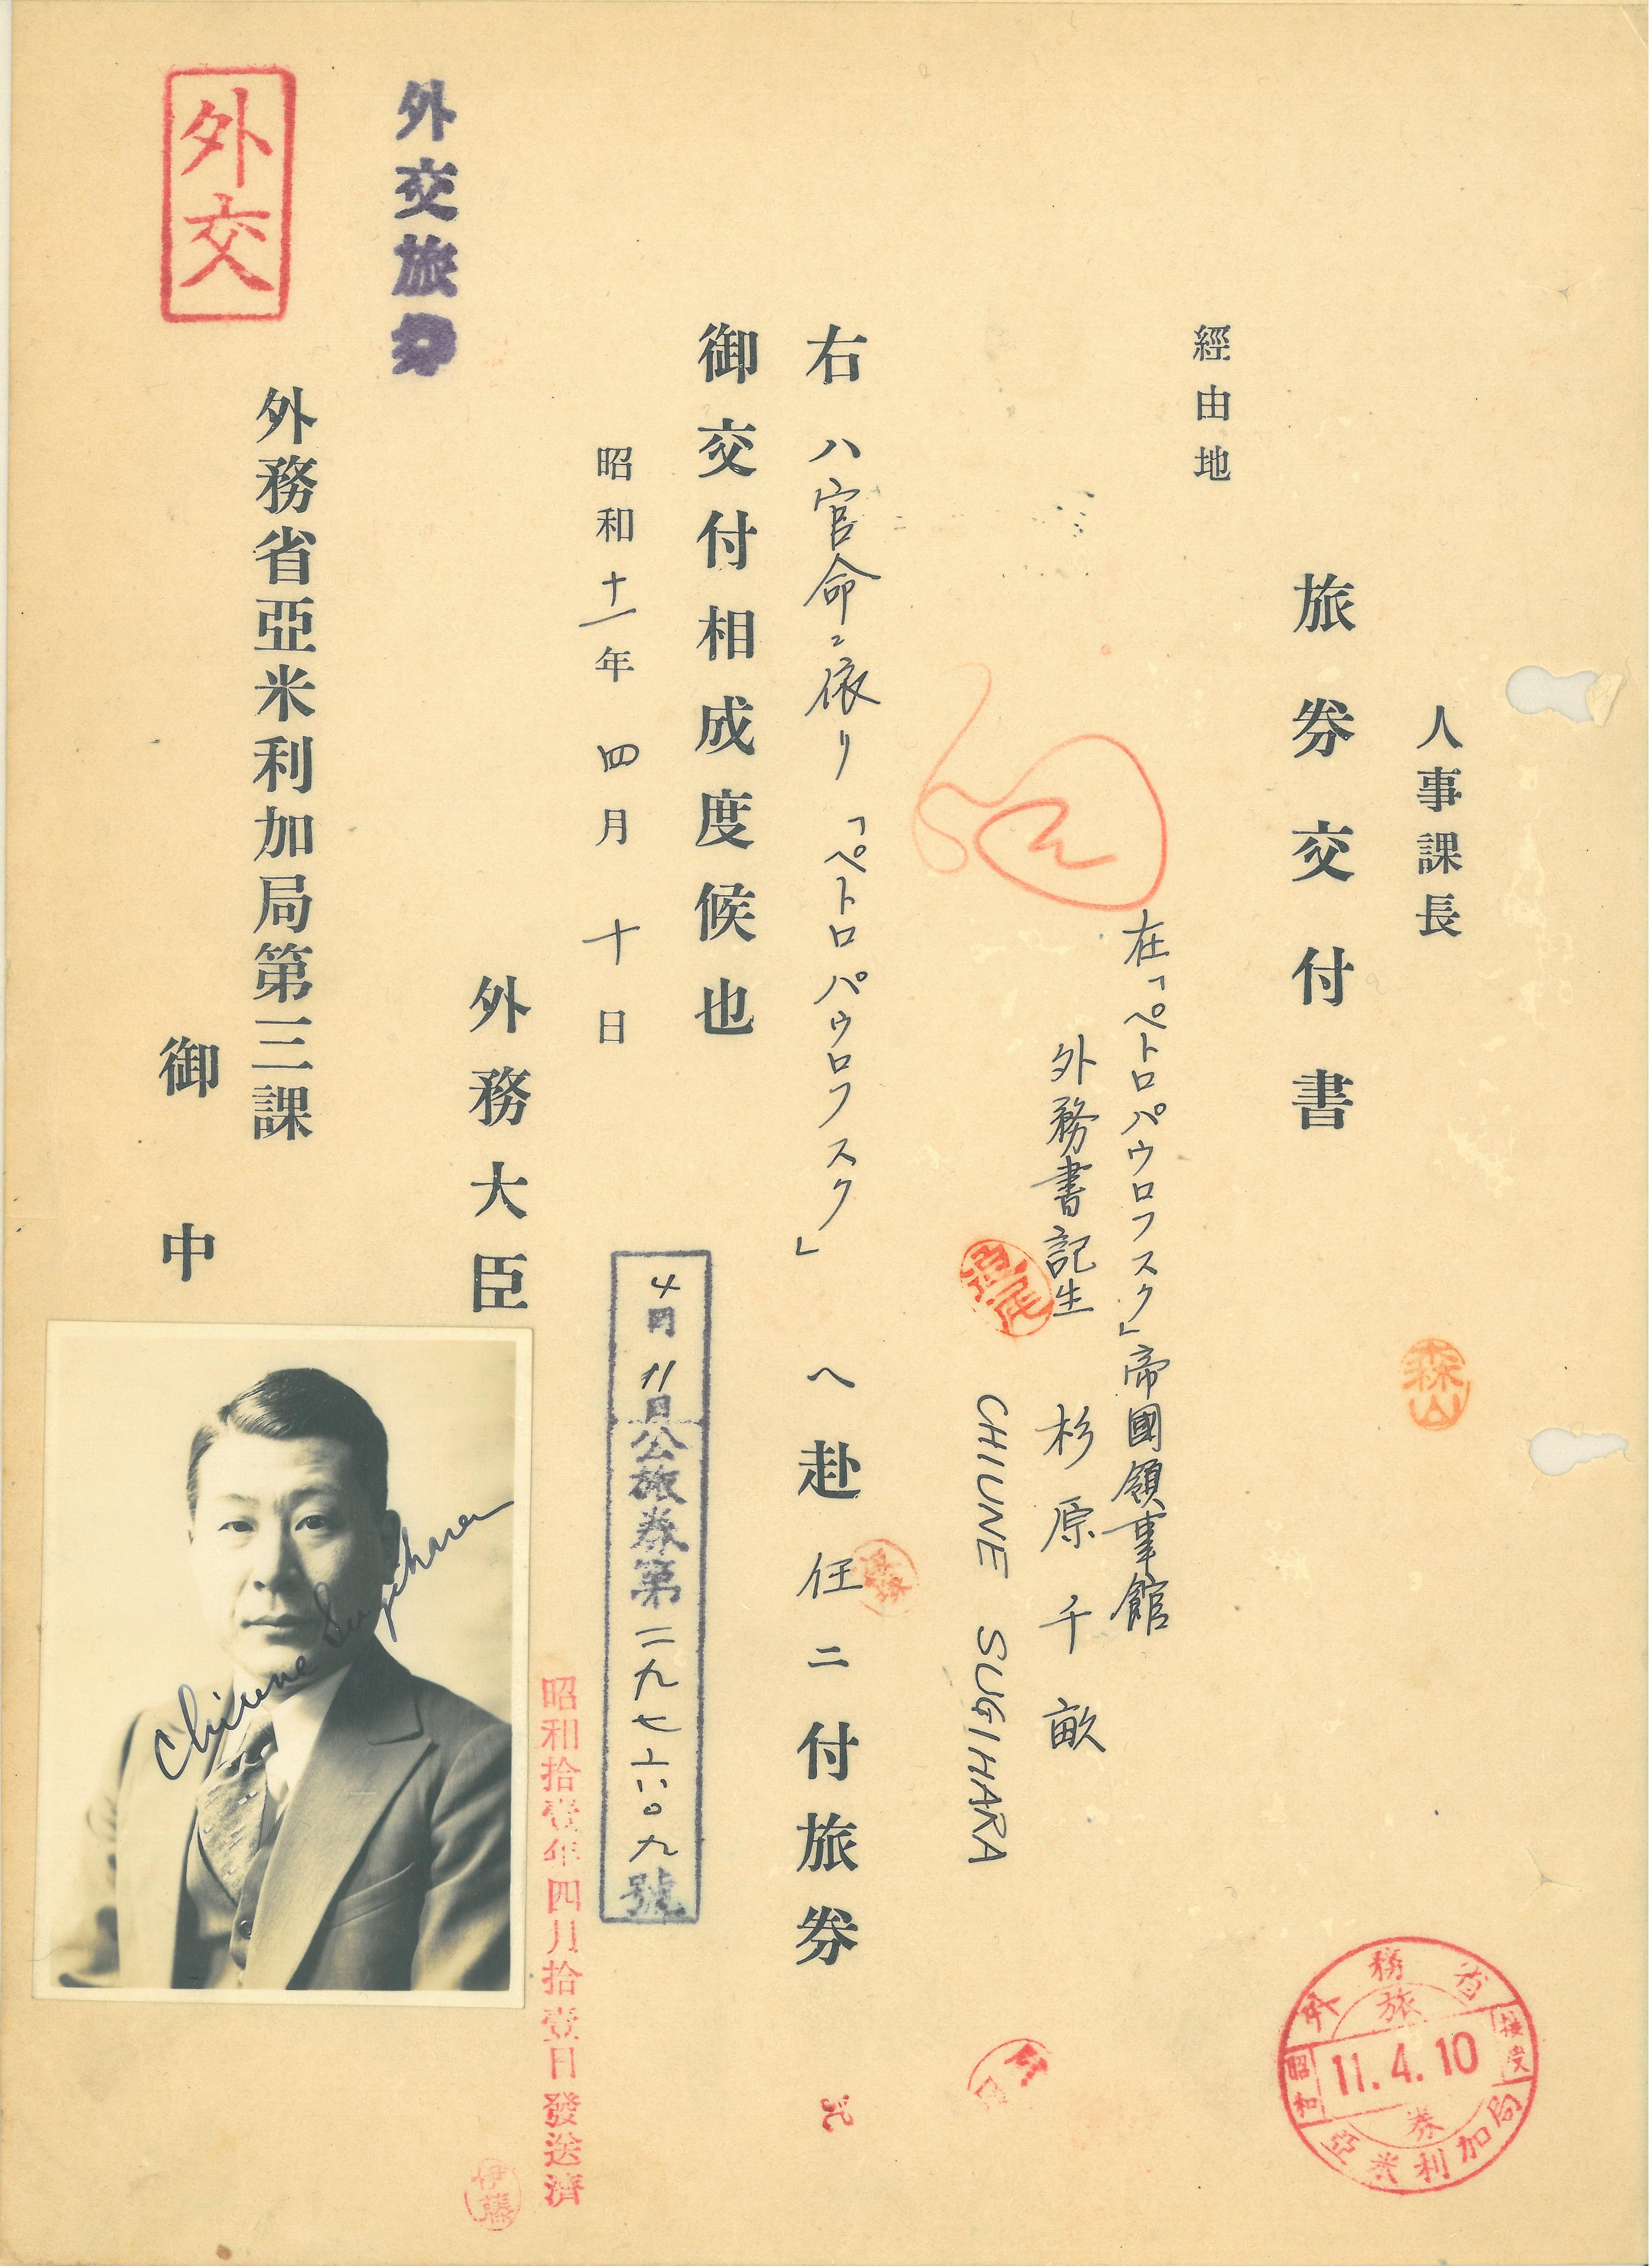 外務省外交史料館所蔵の杉原千畝の旅券交付書